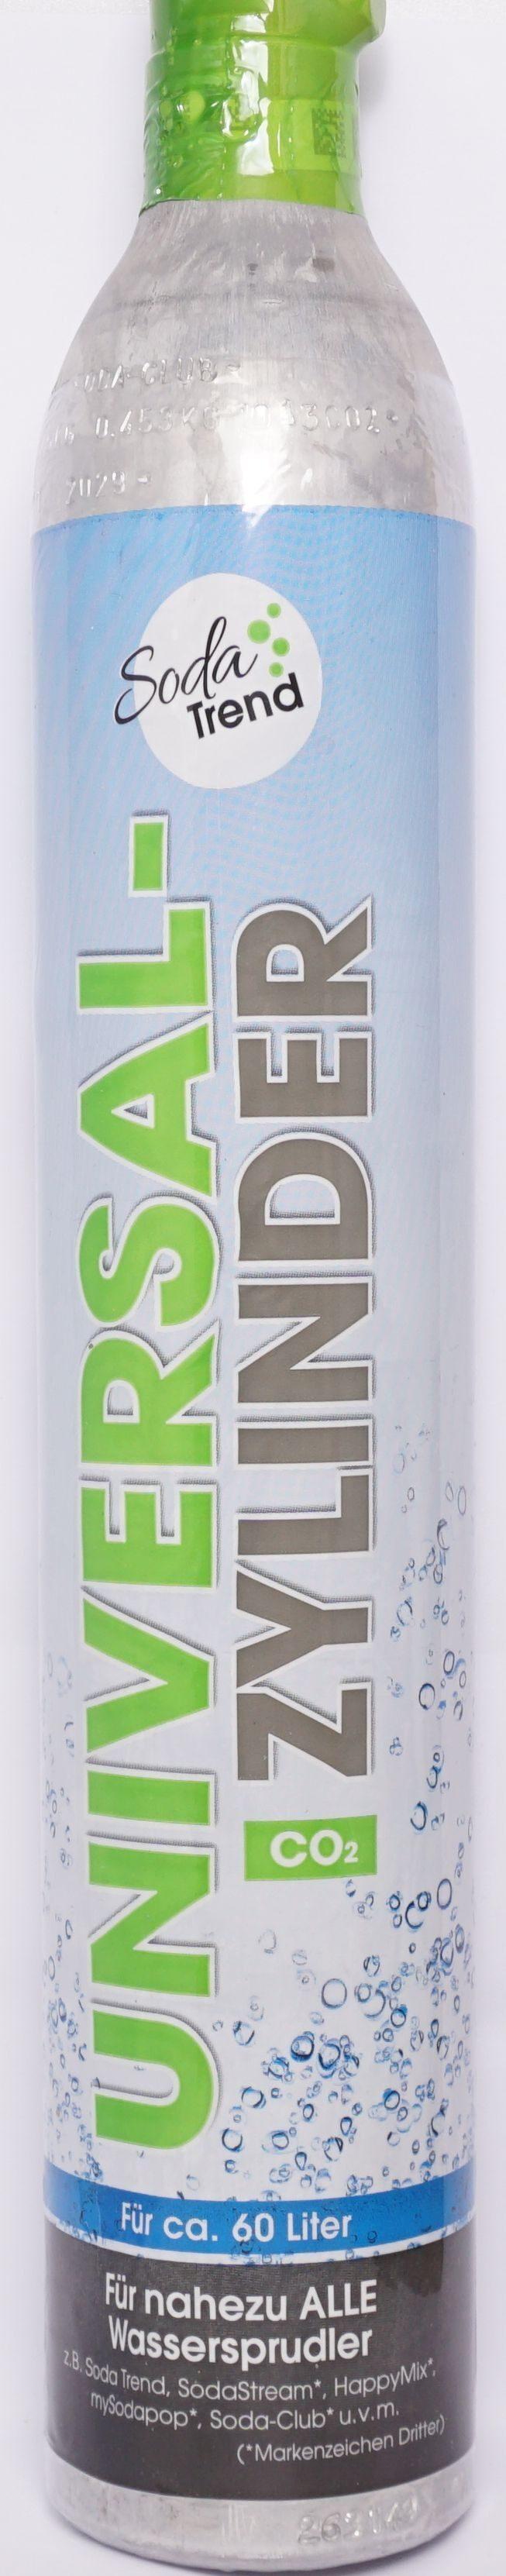 Universalzylinder CO2 - Product - de